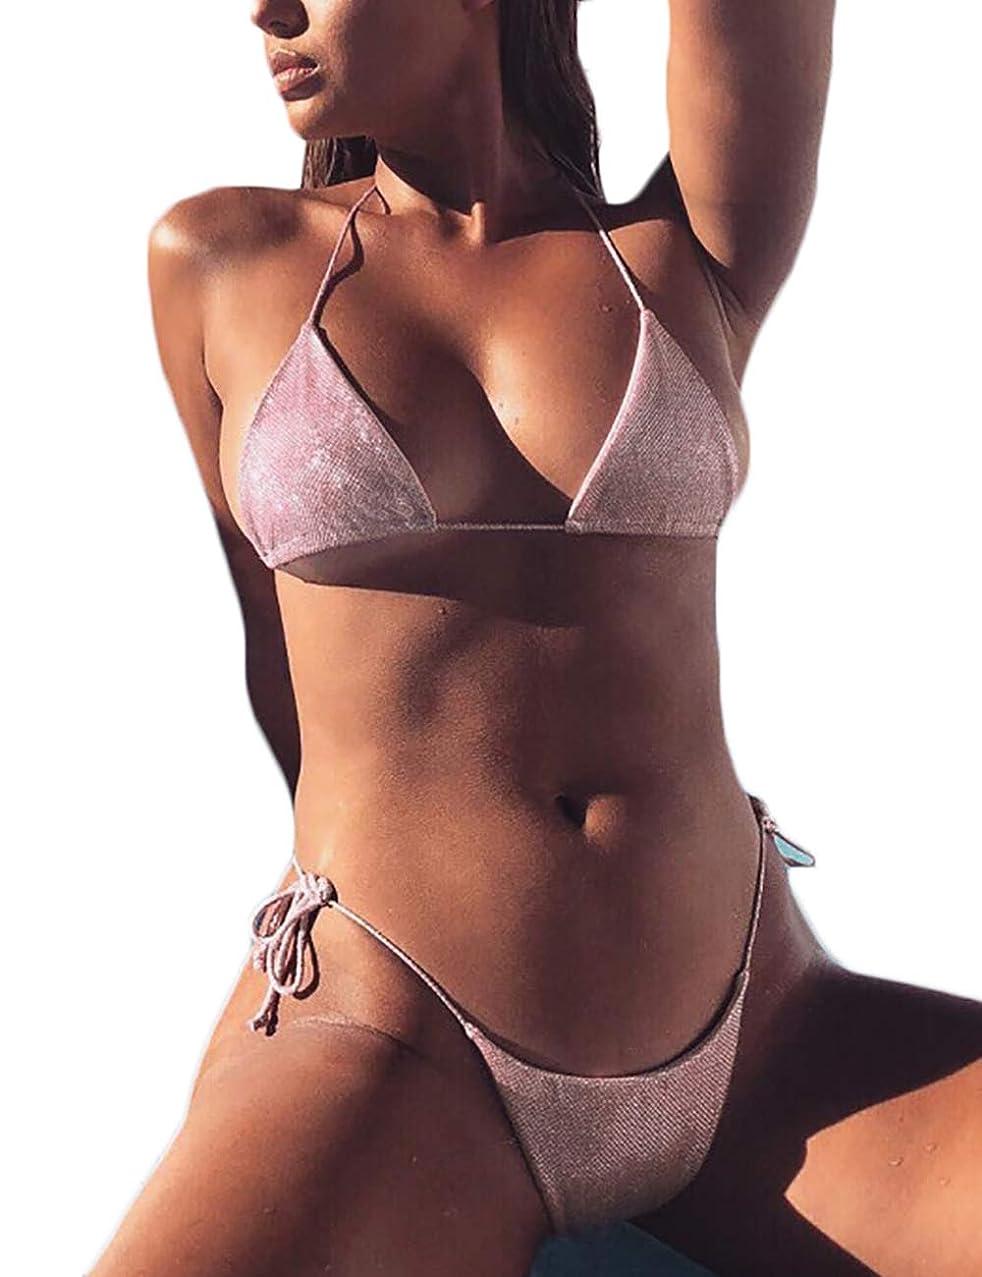 NAFLEAP Women Cheeky Padded Thong Bikini 2 Pieces Brazilian Halter Ties Bathing Suit